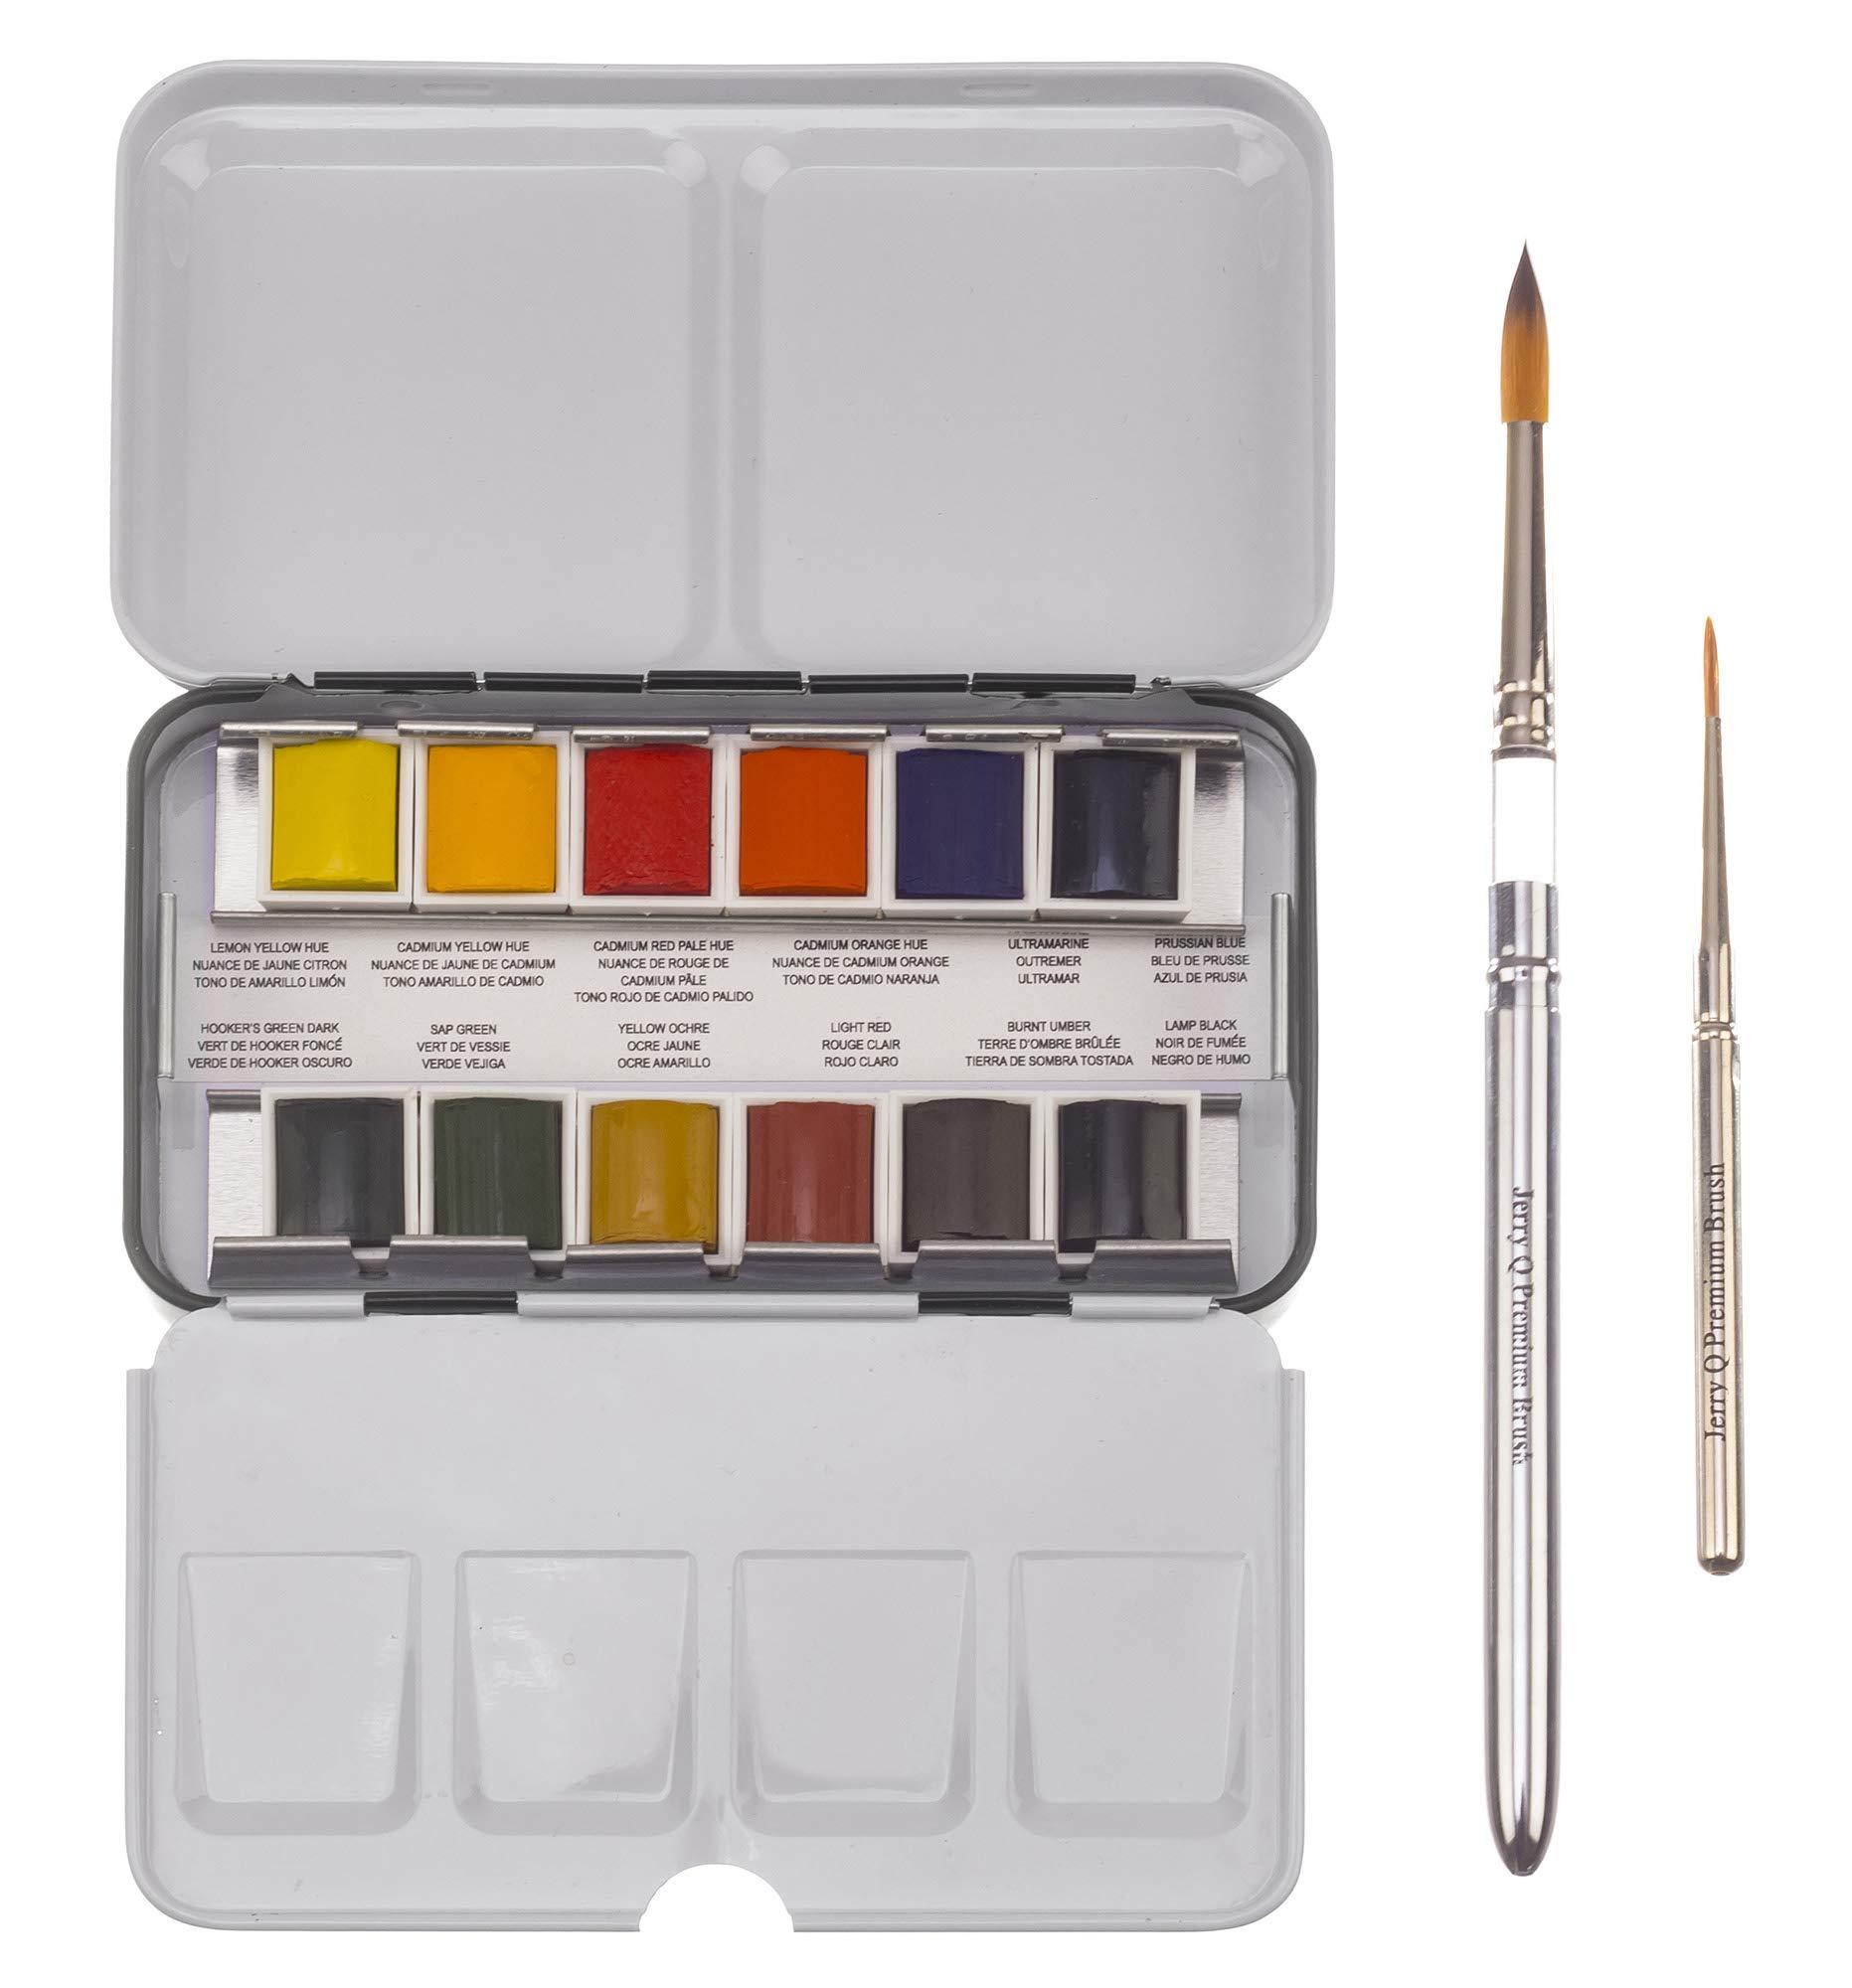 Jerry Q Art 12 Assorted Artist Grade Premium Water Colour Travel Pocket Set with 2 Brushes, Half Pans-JQ 12 Professional